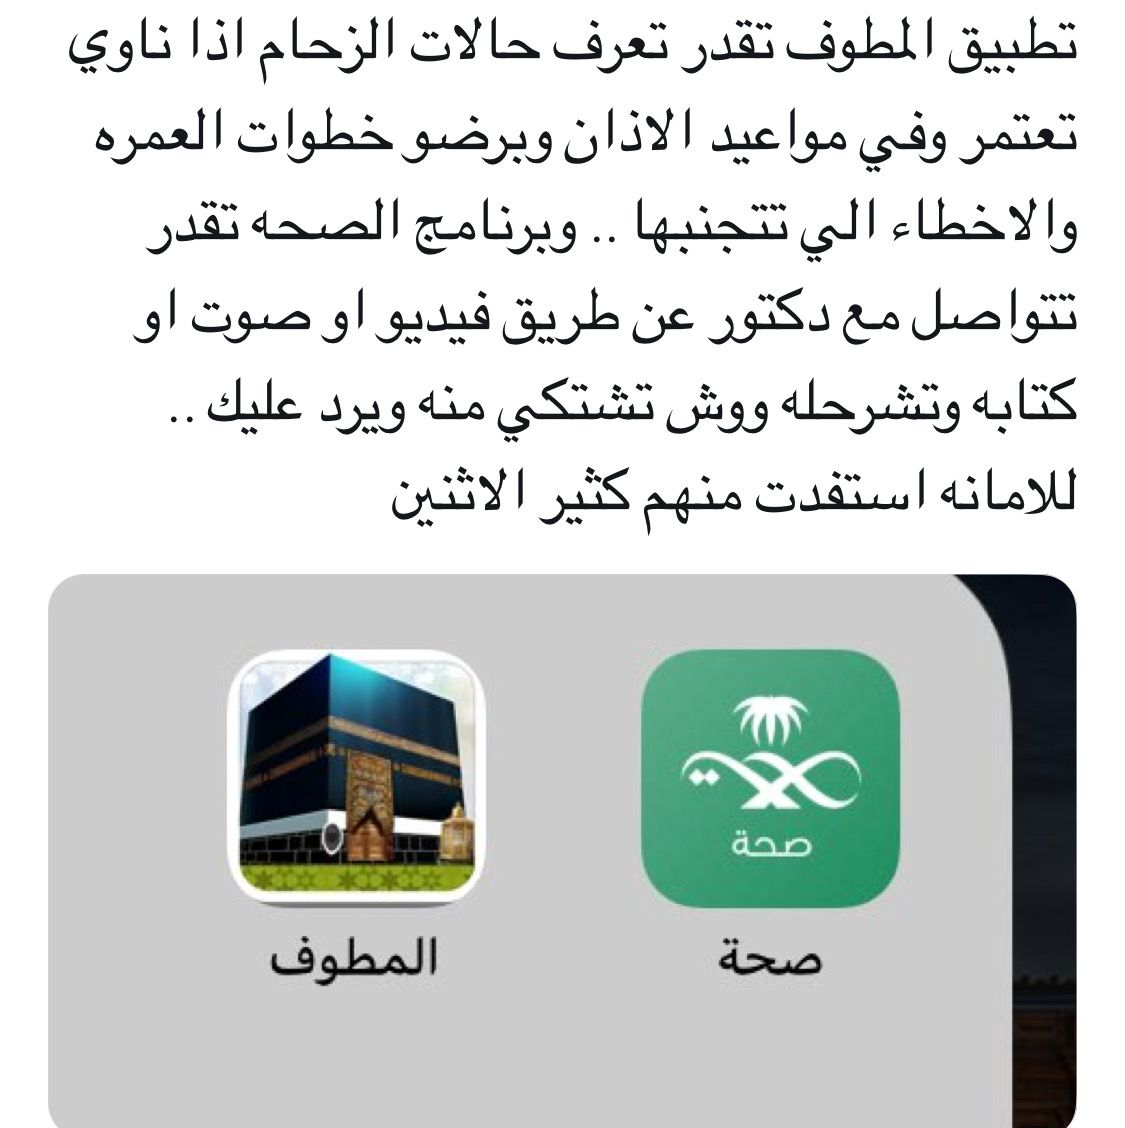 Pin by Mohamed Awad Mandour on مواقع وتطبيقات